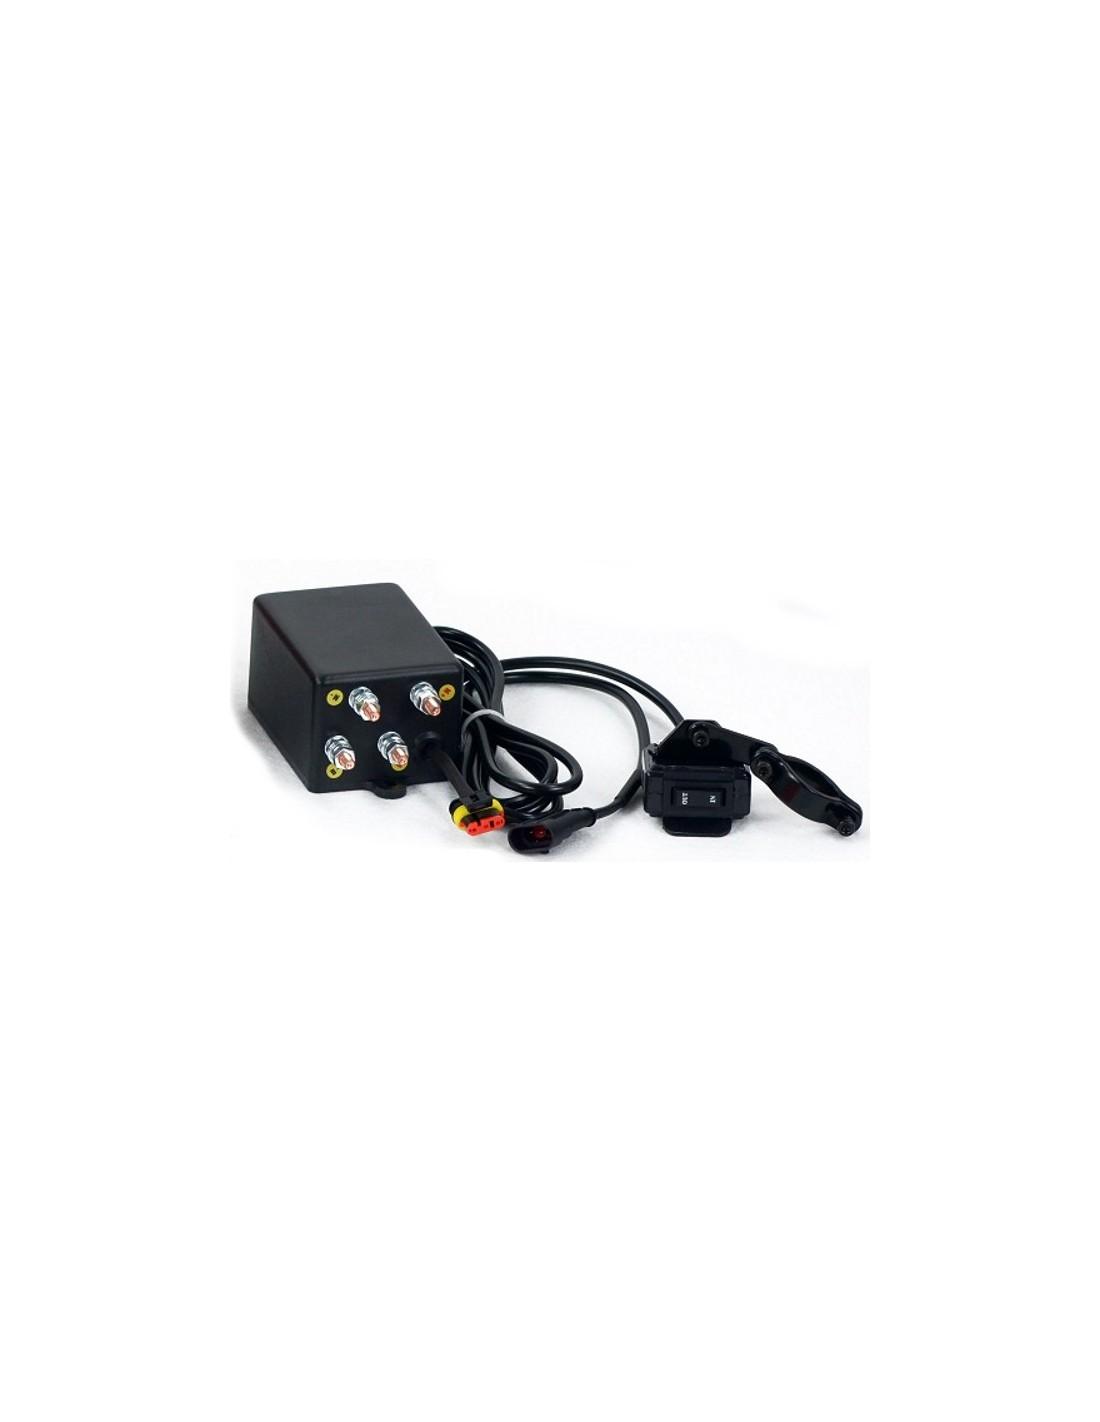 treuil electrique powerwinch 2041 kg 12v avec radio commande. Black Bedroom Furniture Sets. Home Design Ideas